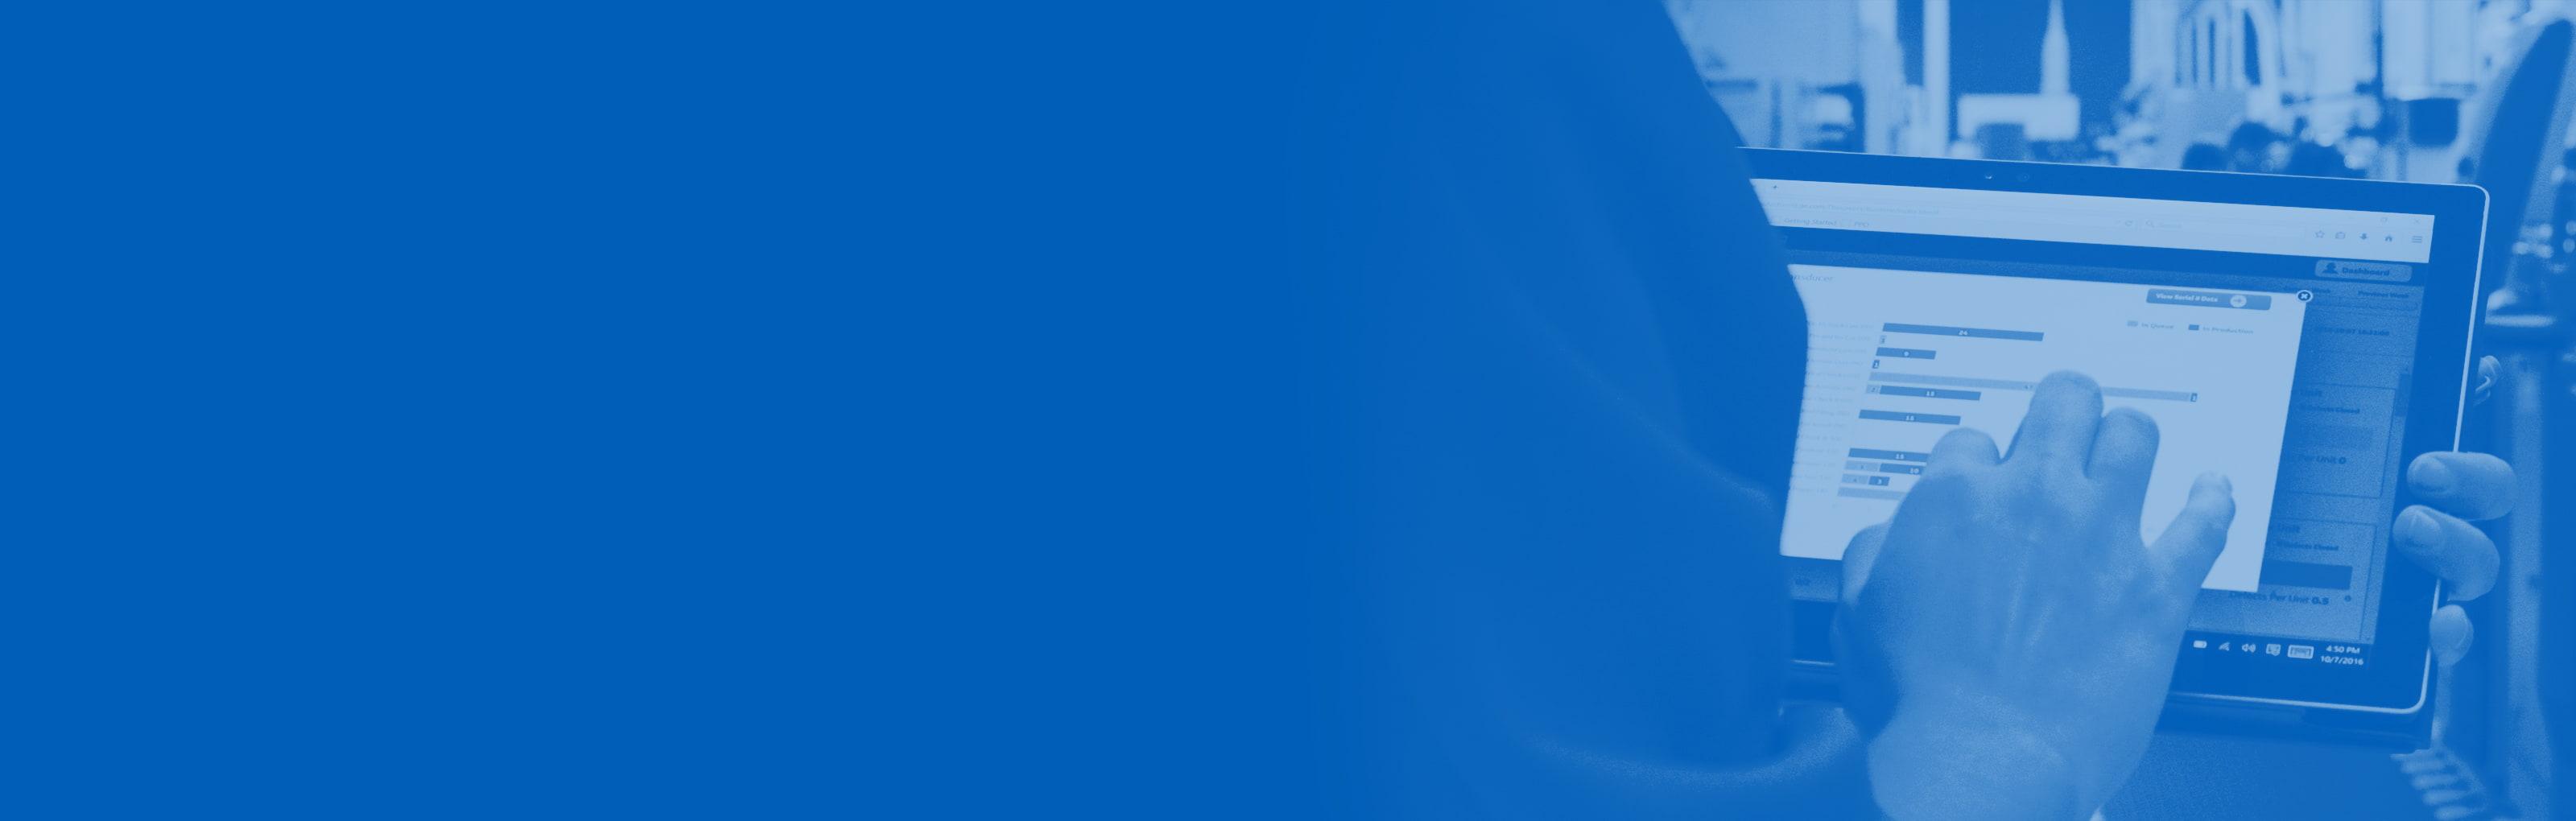 Predix Manufacturing Execution Systems (Predix MES) | Blog Banner | GE Digital